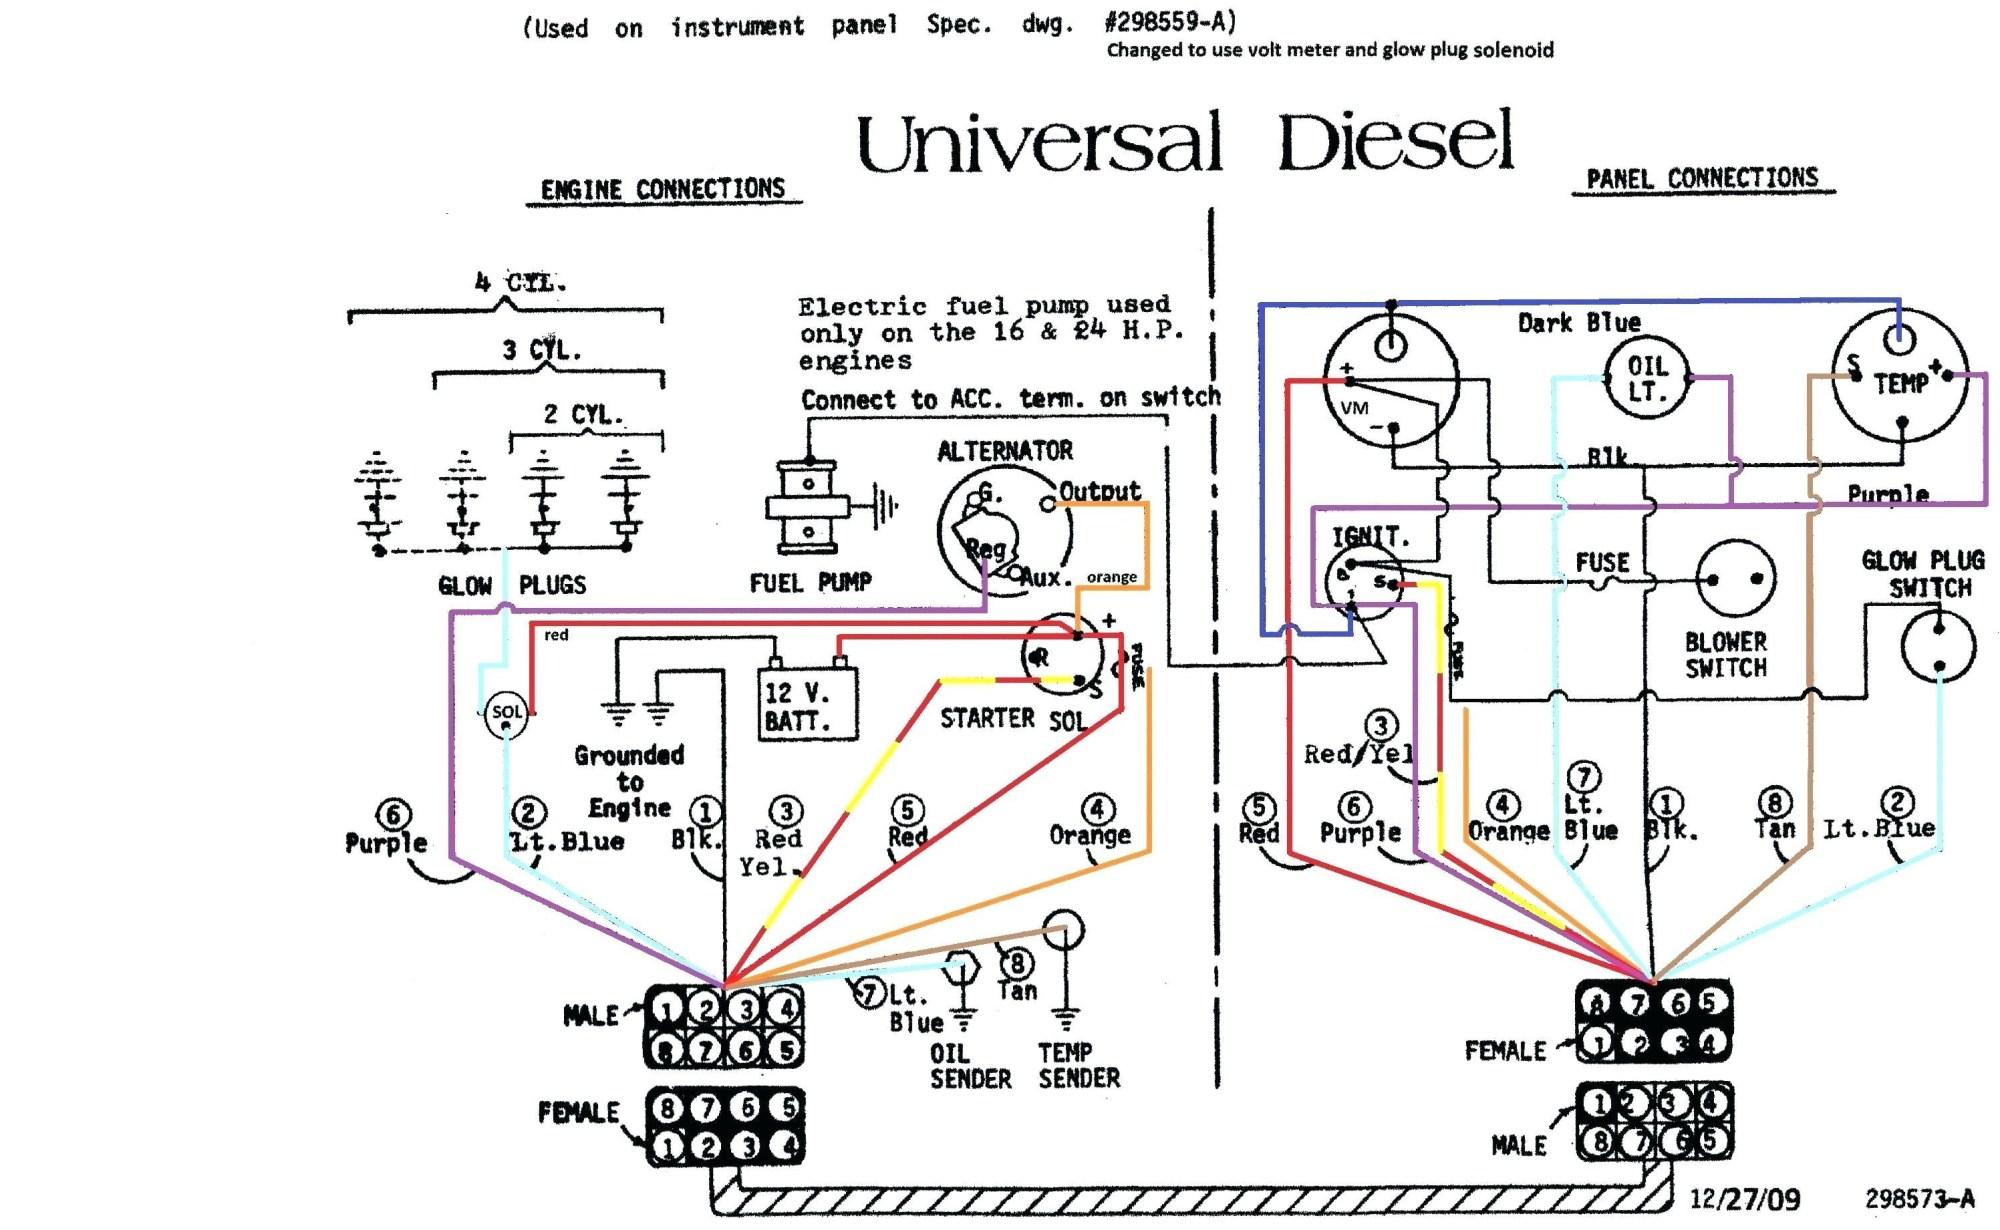 hight resolution of alternator wiring diagram inspirational astonishing isuzu diesel alternator wiring diagram contemporary